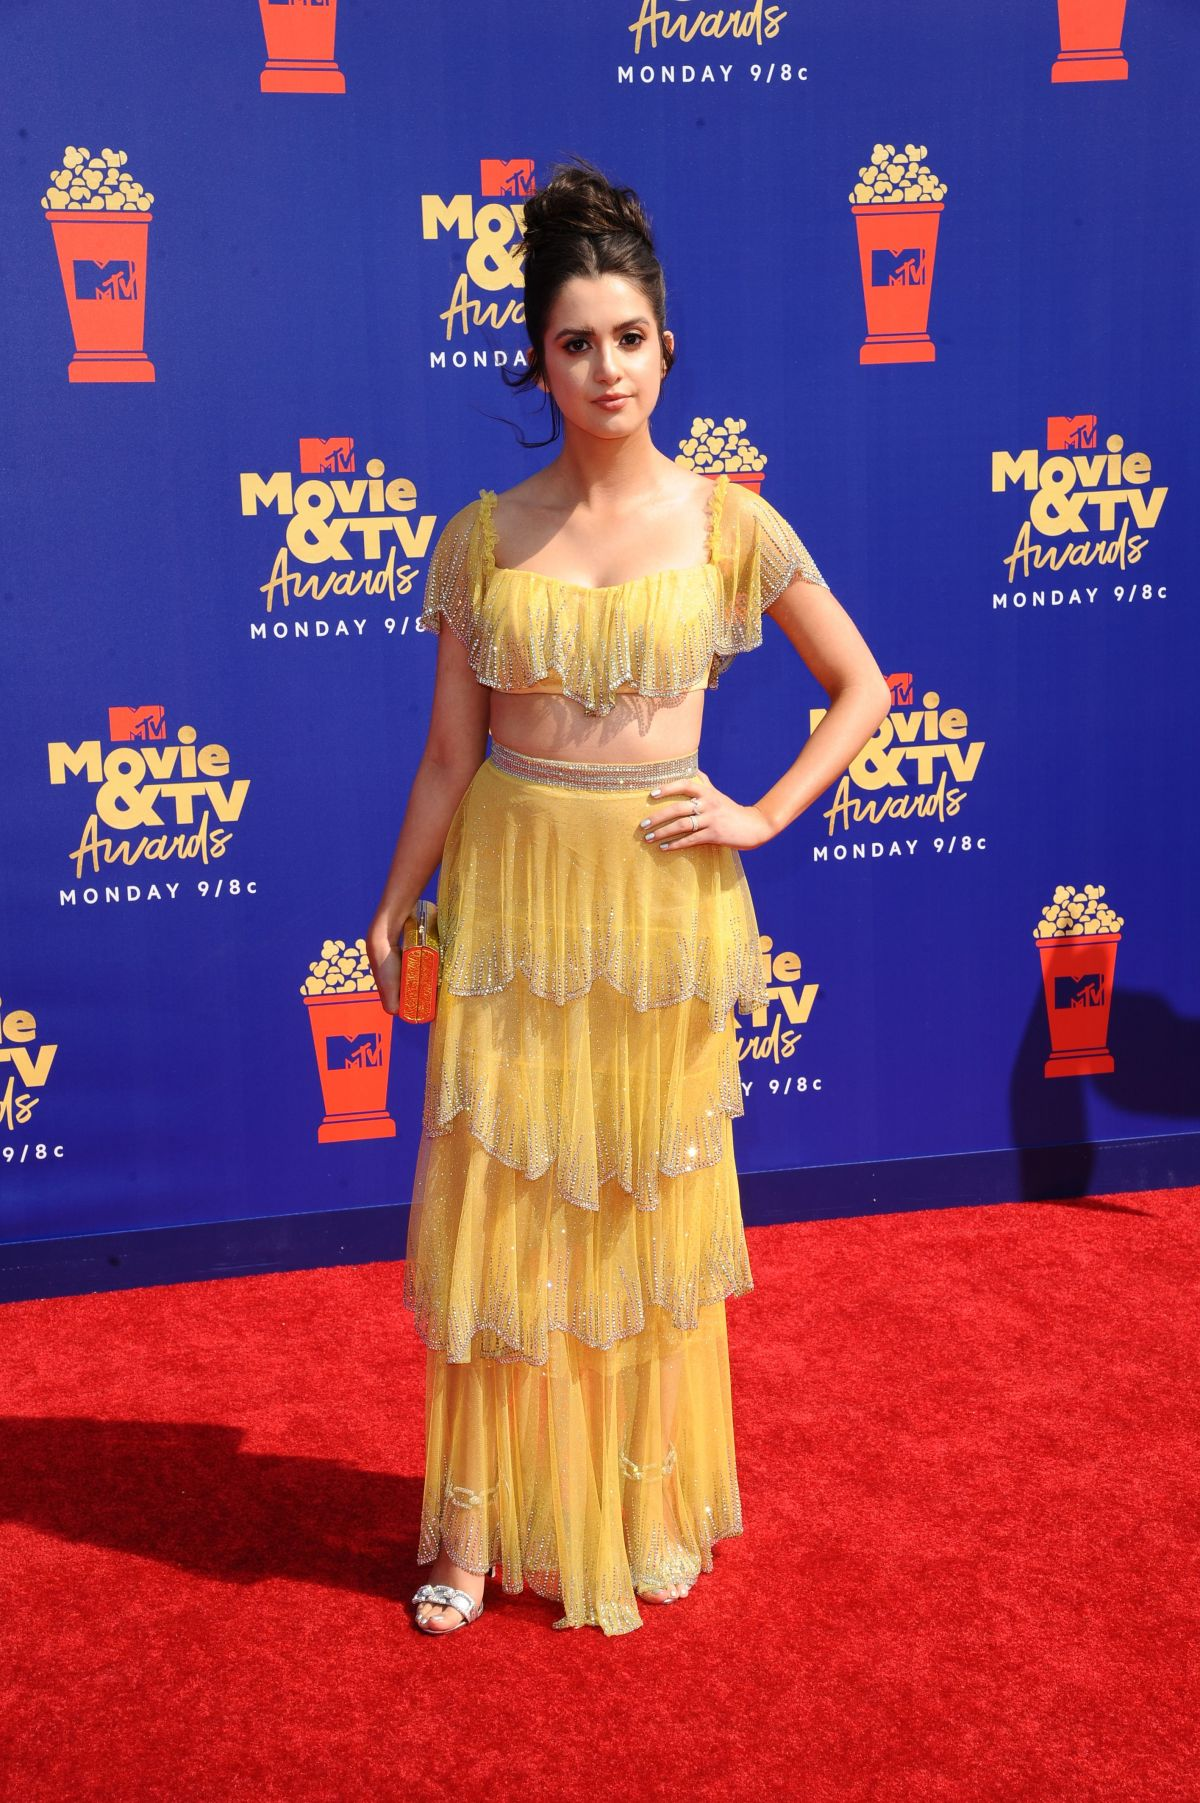 LAURA MARANO at 2019 MTV Movie & TV Awards in Los Angeles 06